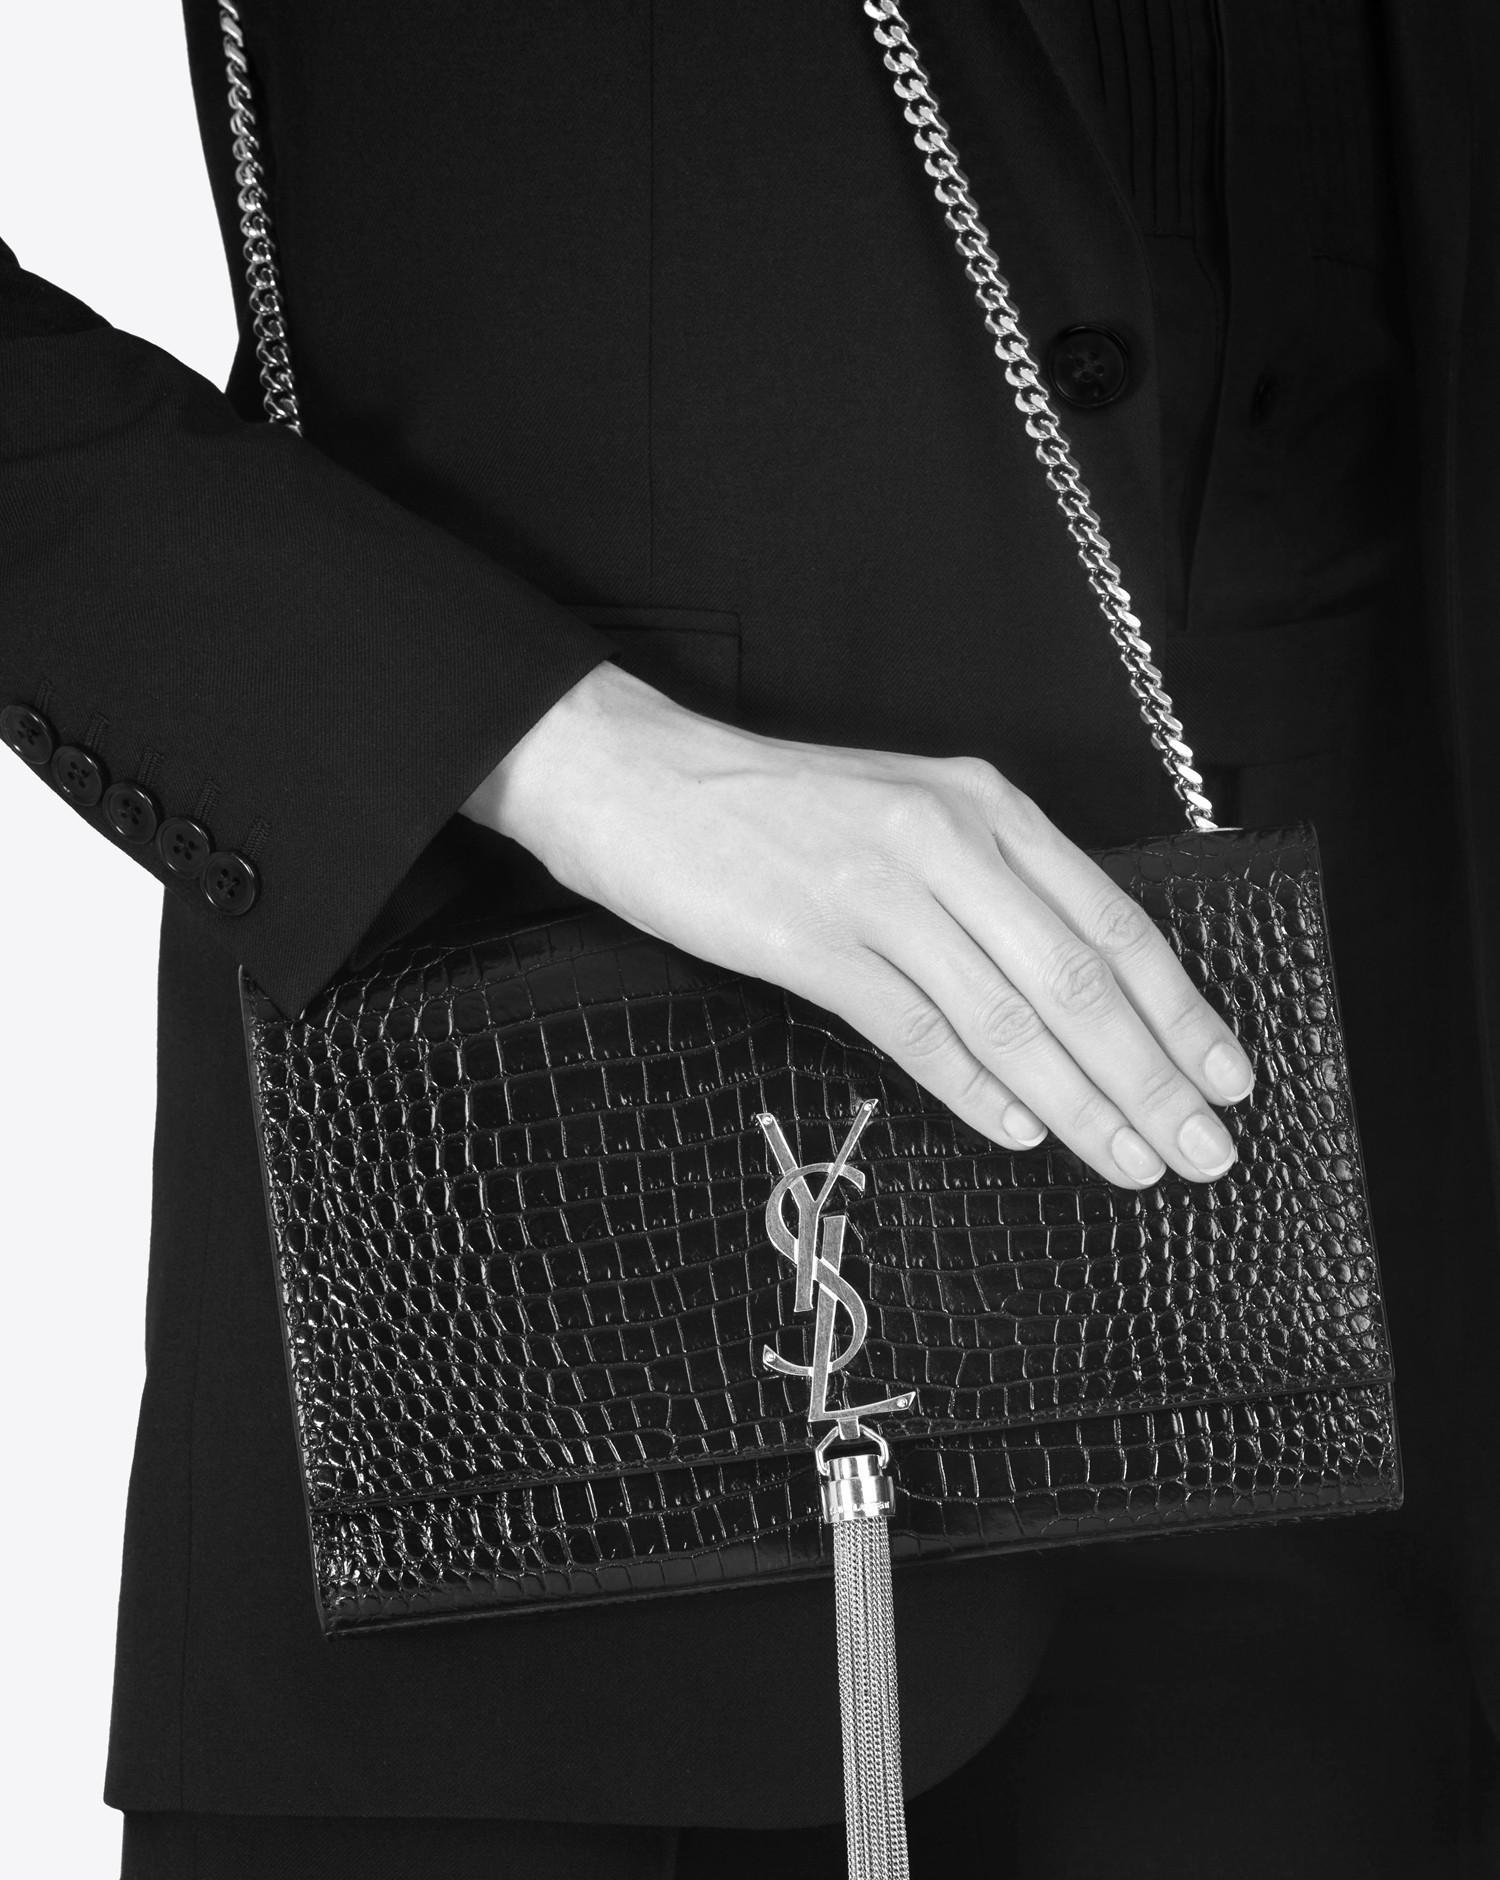 61dce9c9c7 Women's Red Classic Medium Kate Monogram Croc-Embossed Leather Shoulder Bag